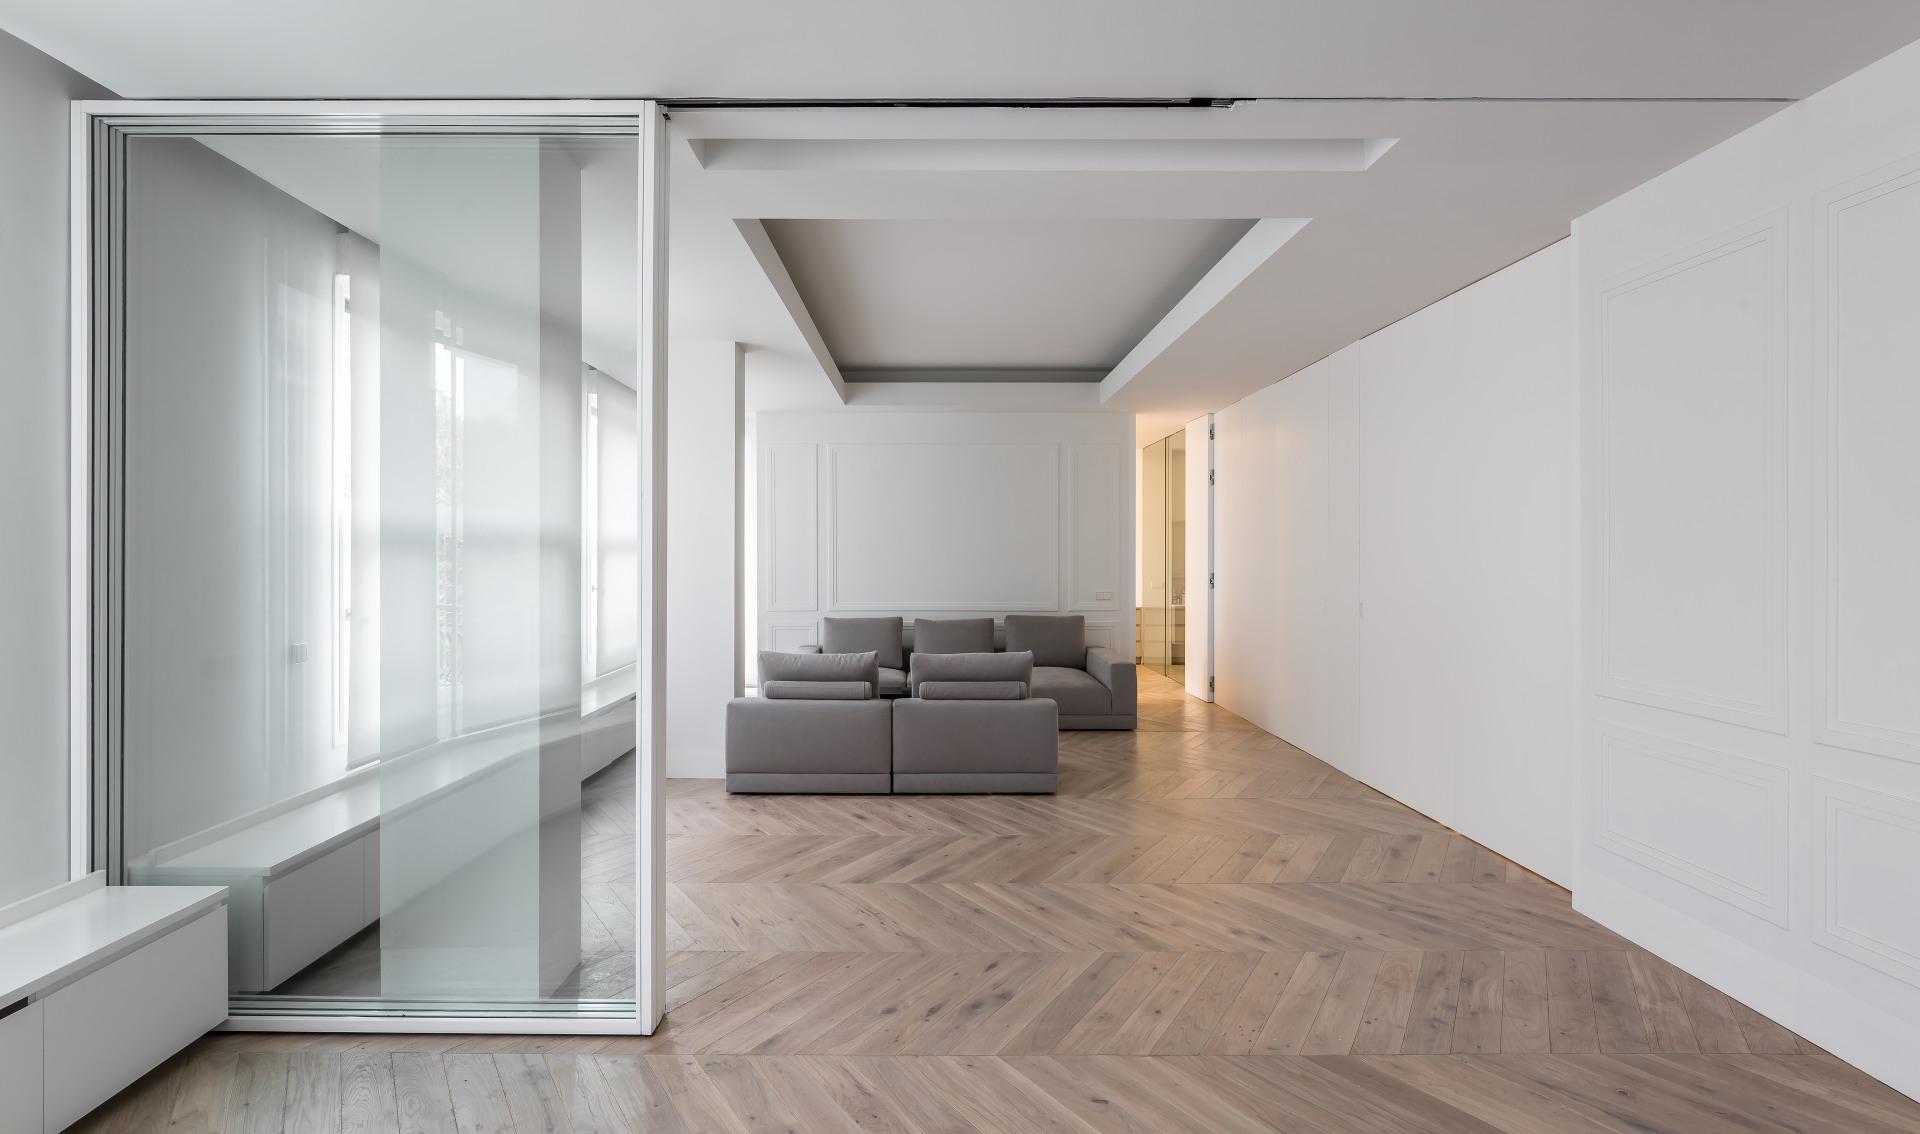 fotografia-arquitectura-valencia-german-cabo-gallardo-llopis-bfm-edificatoria-turia01 (34)